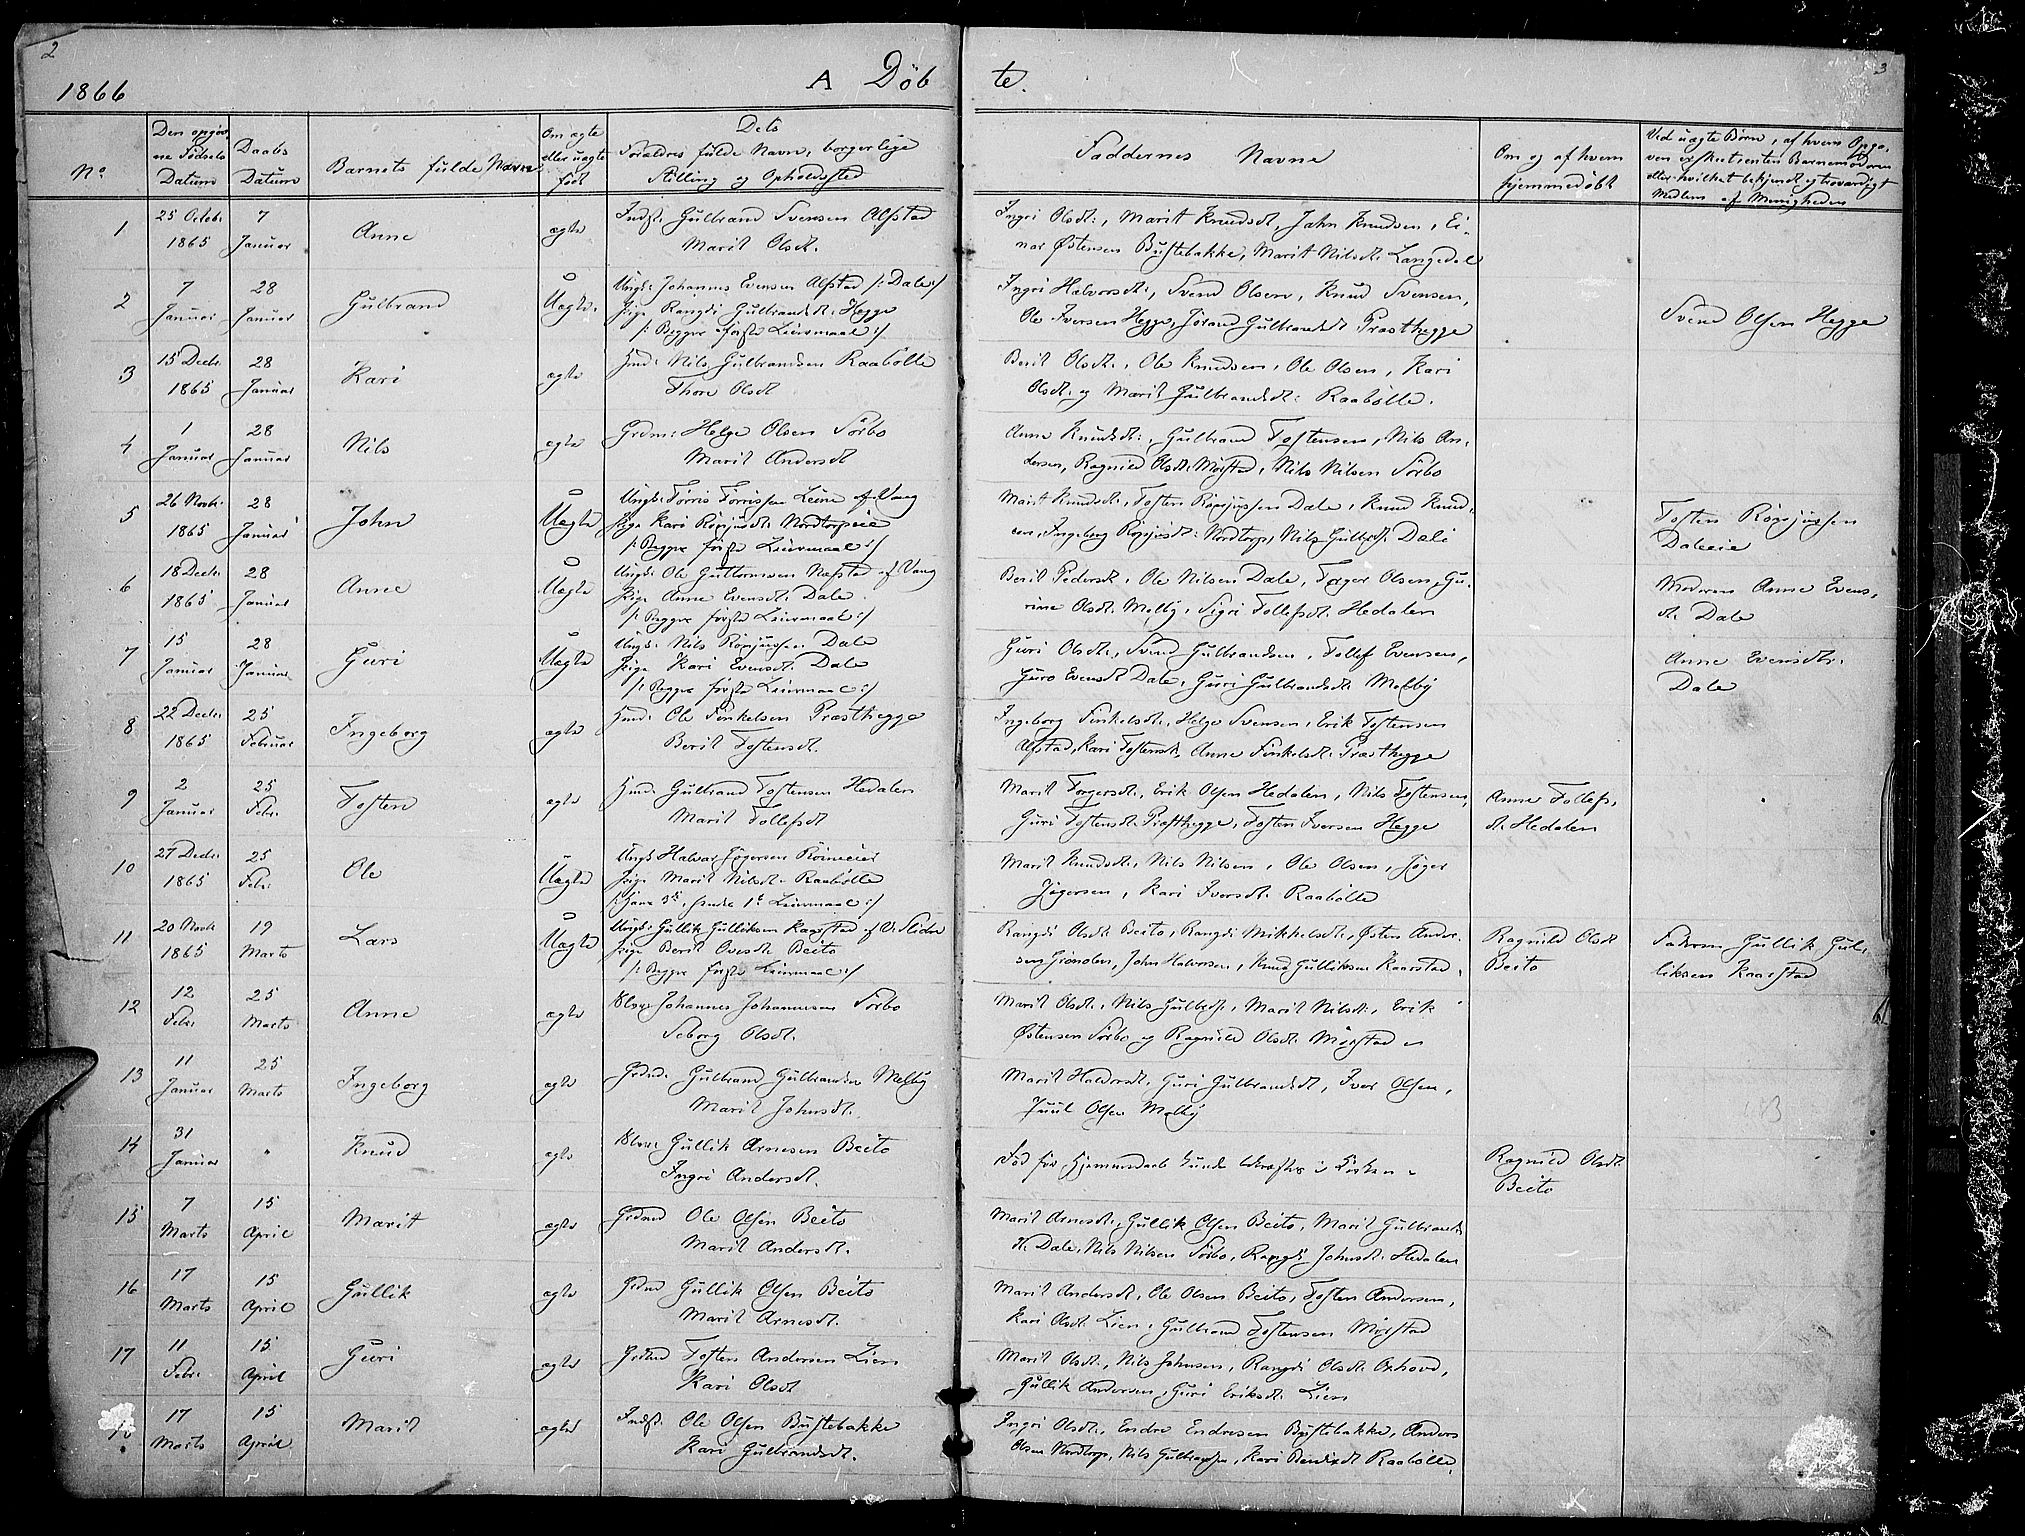 SAH, Øystre Slidre prestekontor, Klokkerbok nr. 1, 1866-1886, s. 2-3